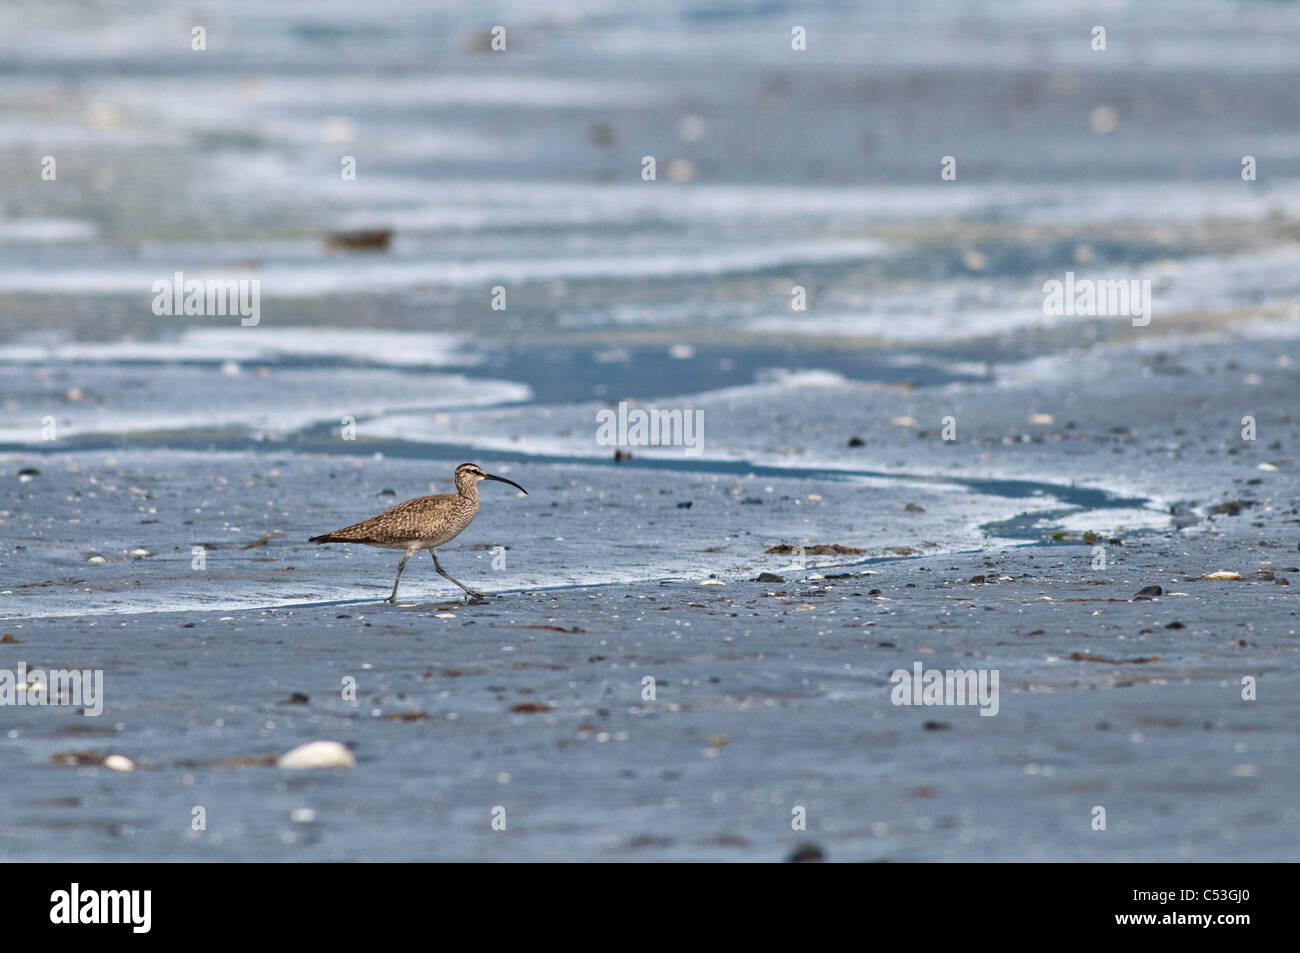 Ein einsamer Regenbrachvogel Spaziergänge Watt Hartney Bay, Cordova, Prinz-William-Sund, Yunan Alaska, Frühling Stockbild